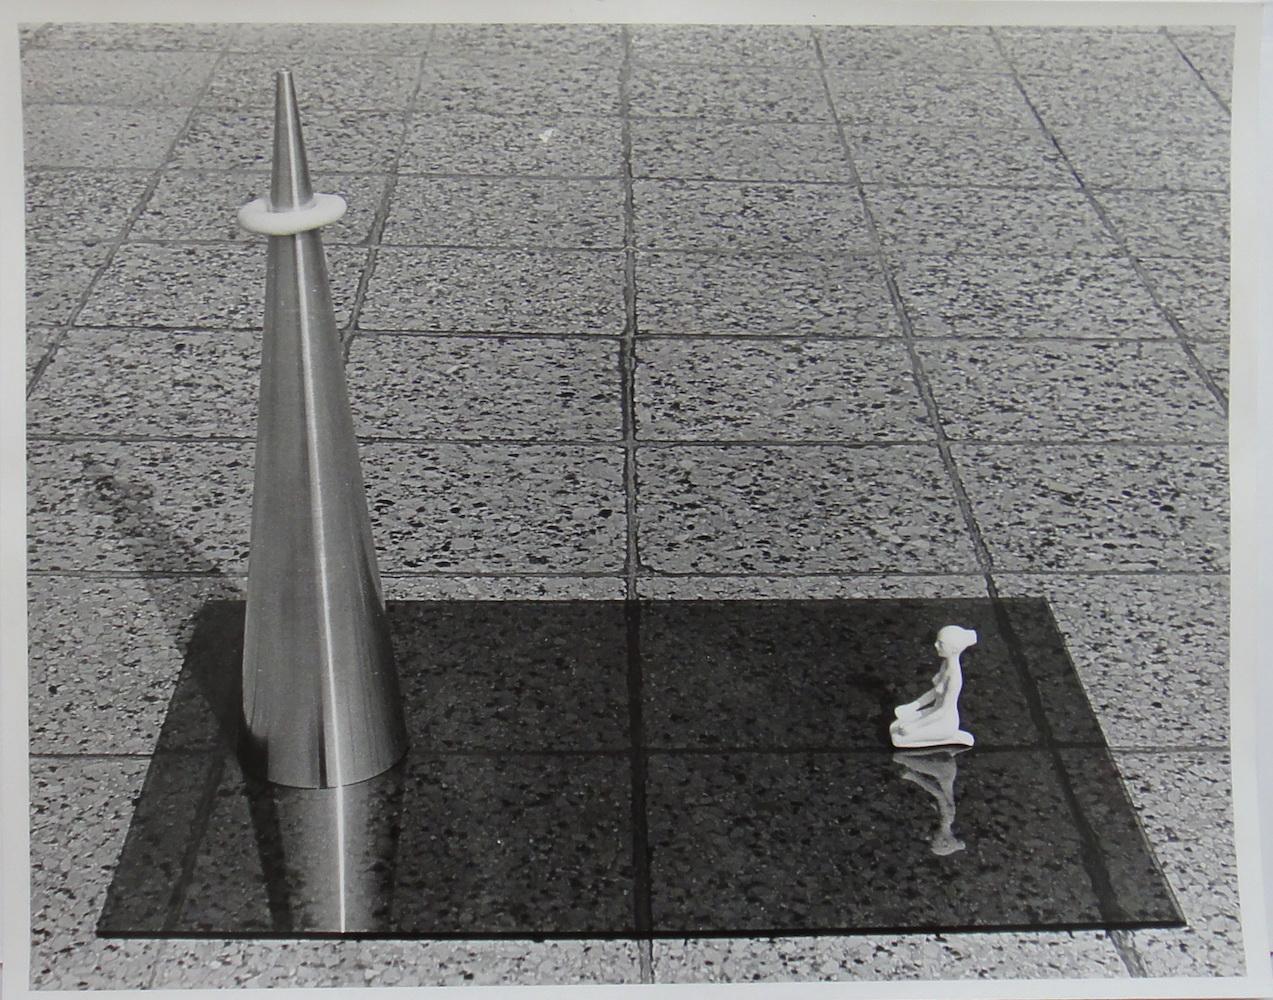 1981, bez názvu, fotografia, 24x30,5 cm